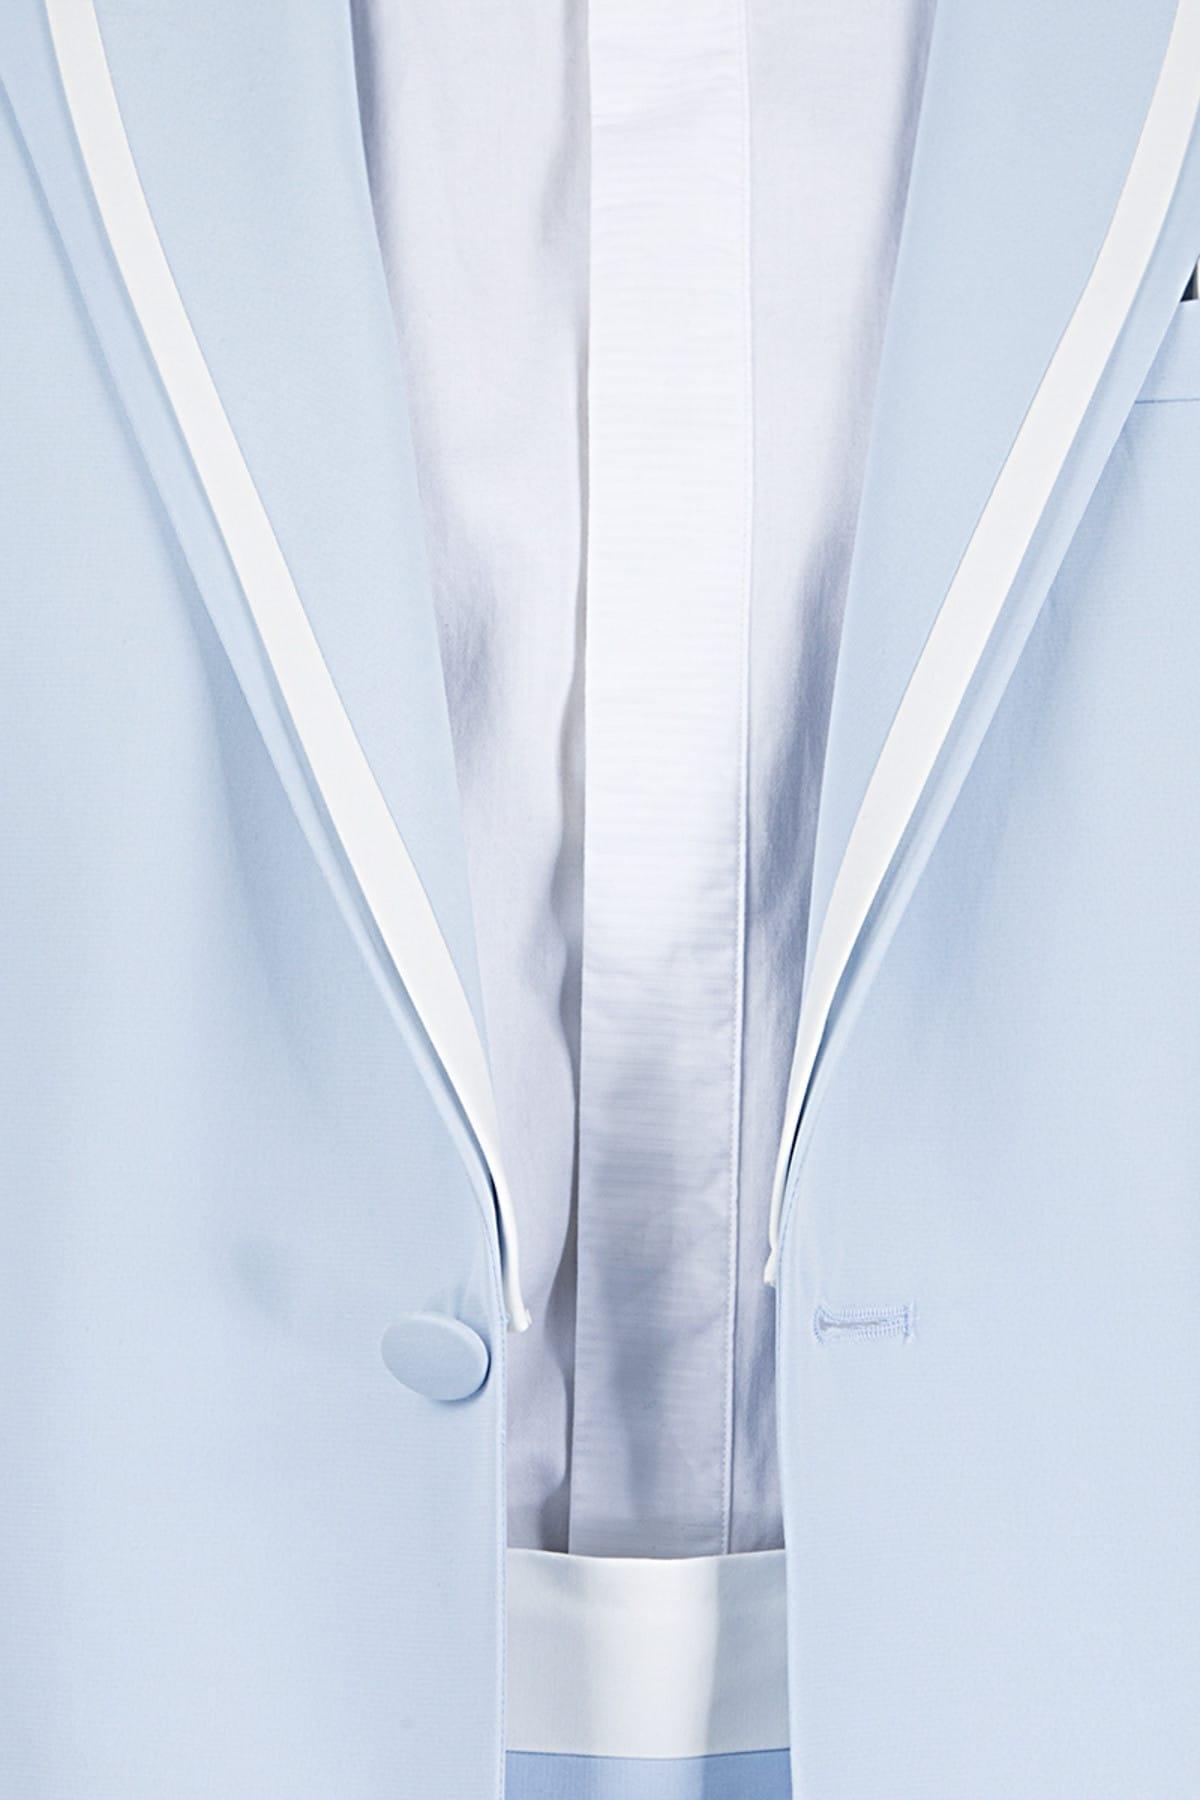 کت شلوار اورجینال برند DS Damat رنگ آبی کد ty4030616